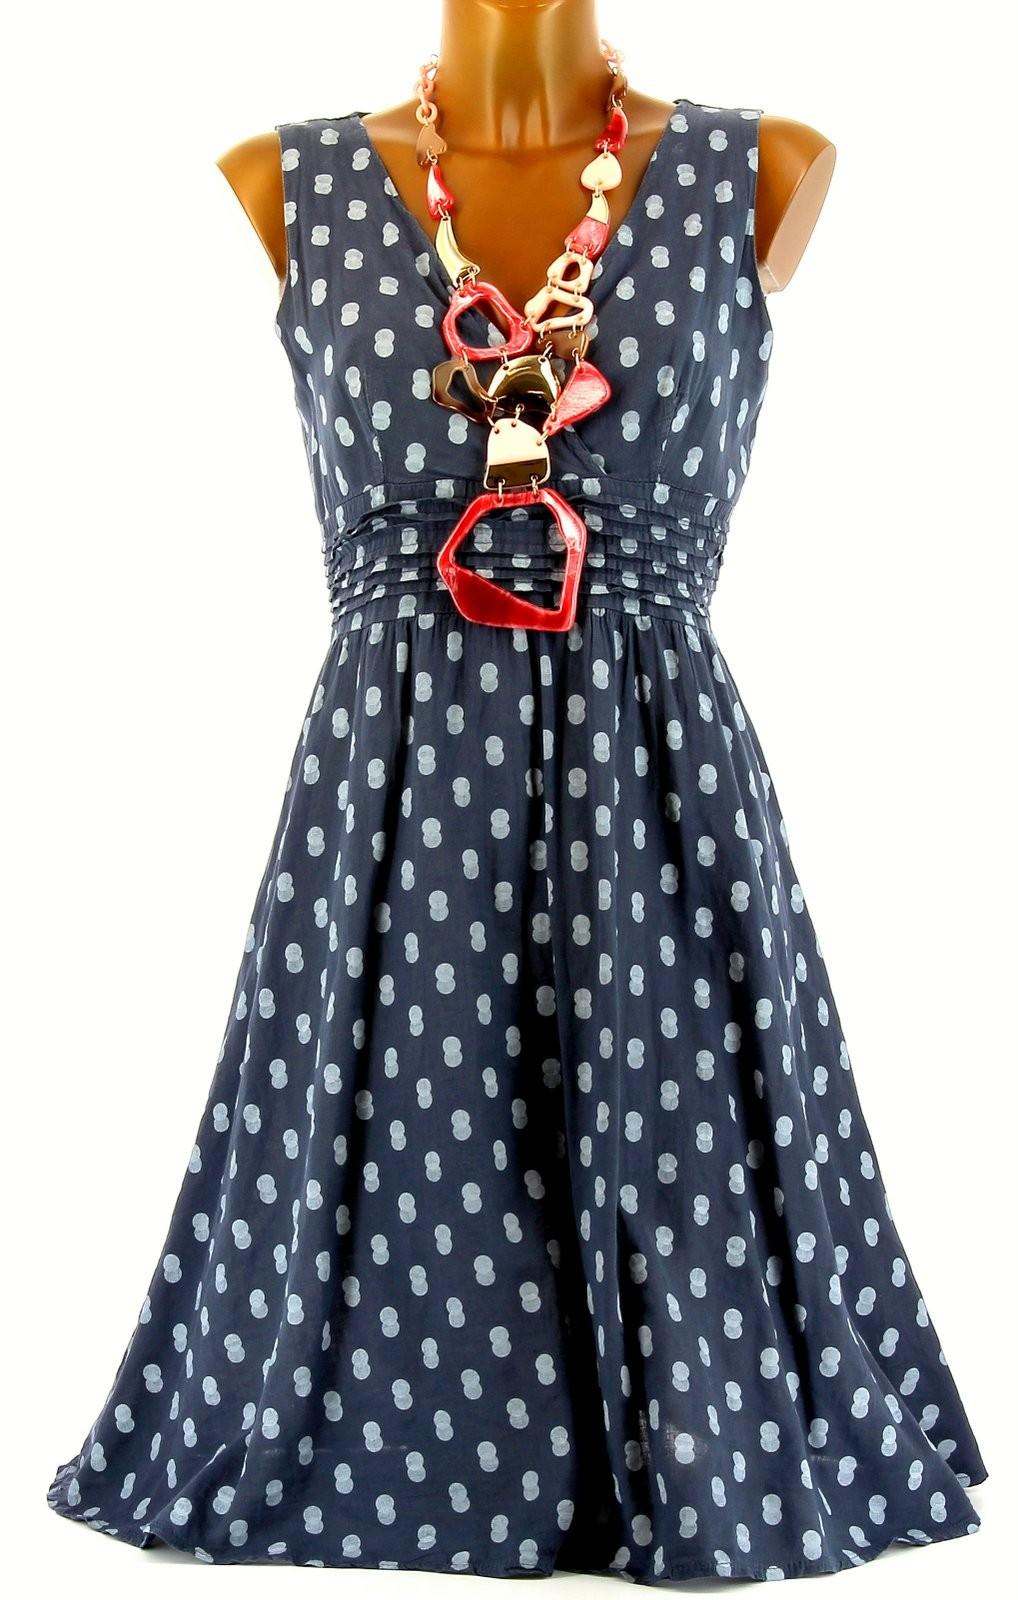 robe t coton boh me chic pois bleu jean nadege bleu ebay. Black Bedroom Furniture Sets. Home Design Ideas